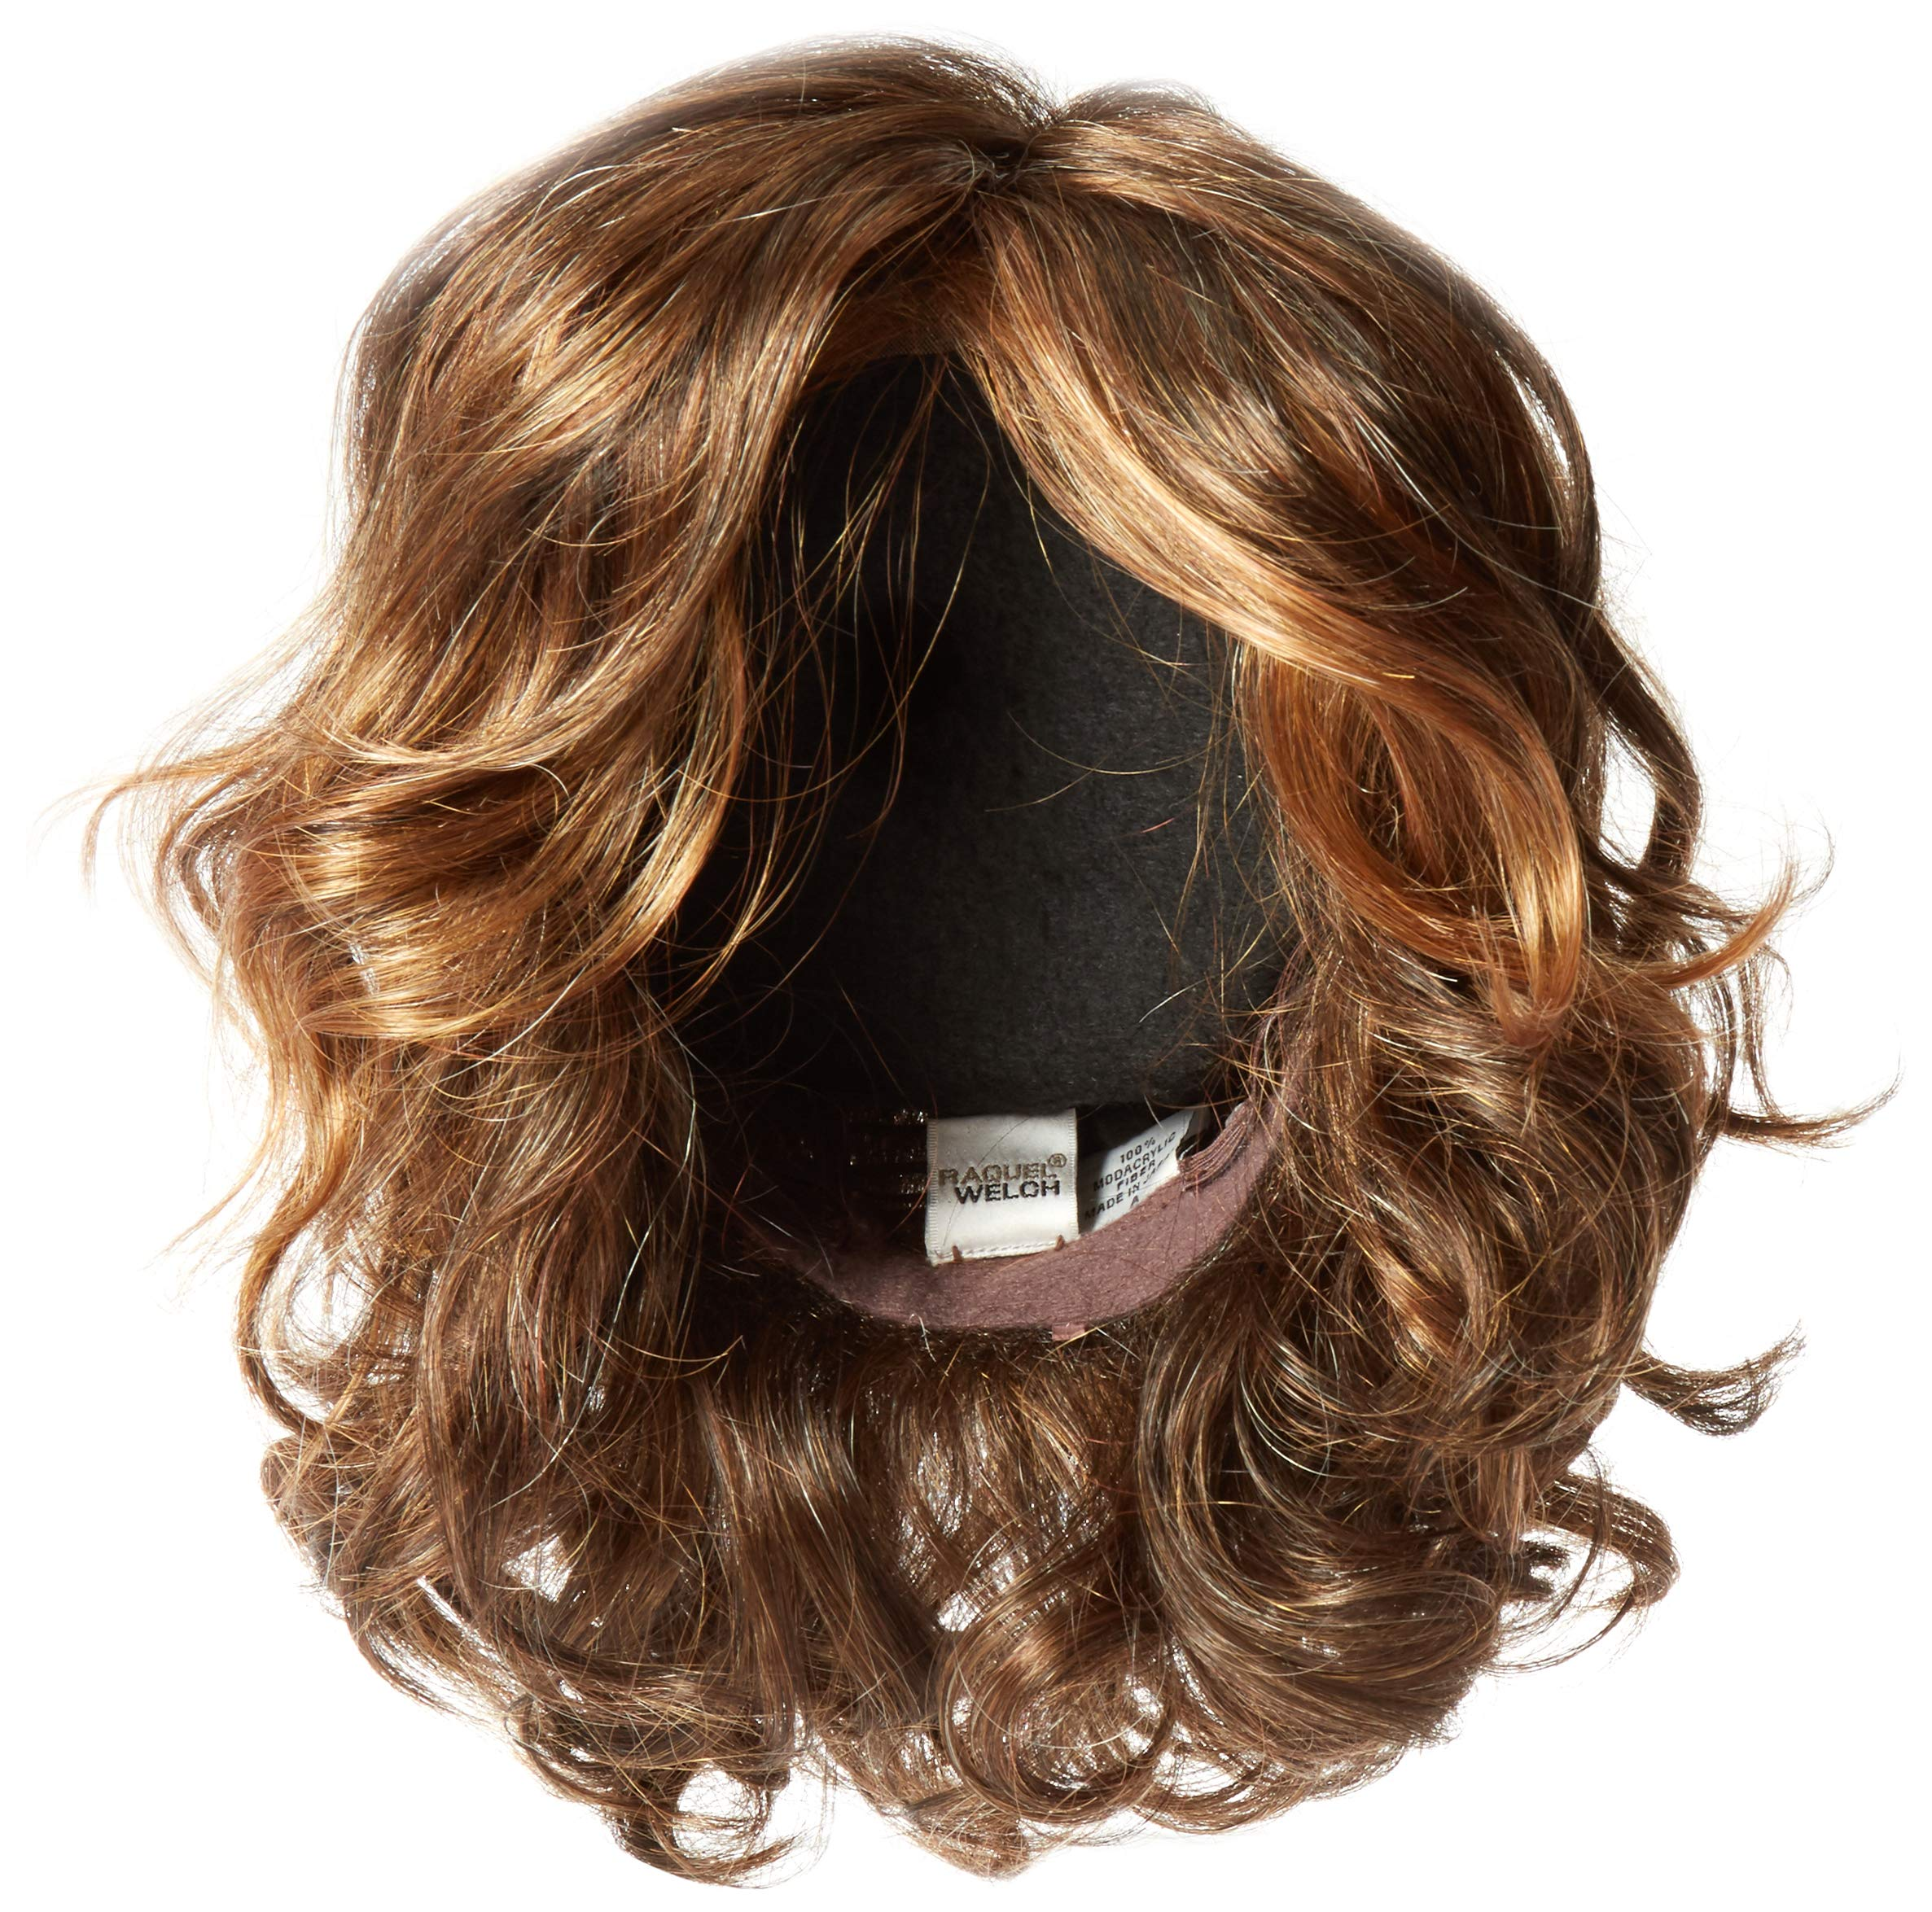 Hairdo Hairuwear Raquel Welch Brave The Wave Collection With Shoulder Length Modern Scrunched Soft Wavy Chic Hair, R829S+ Glazed Hazelnut